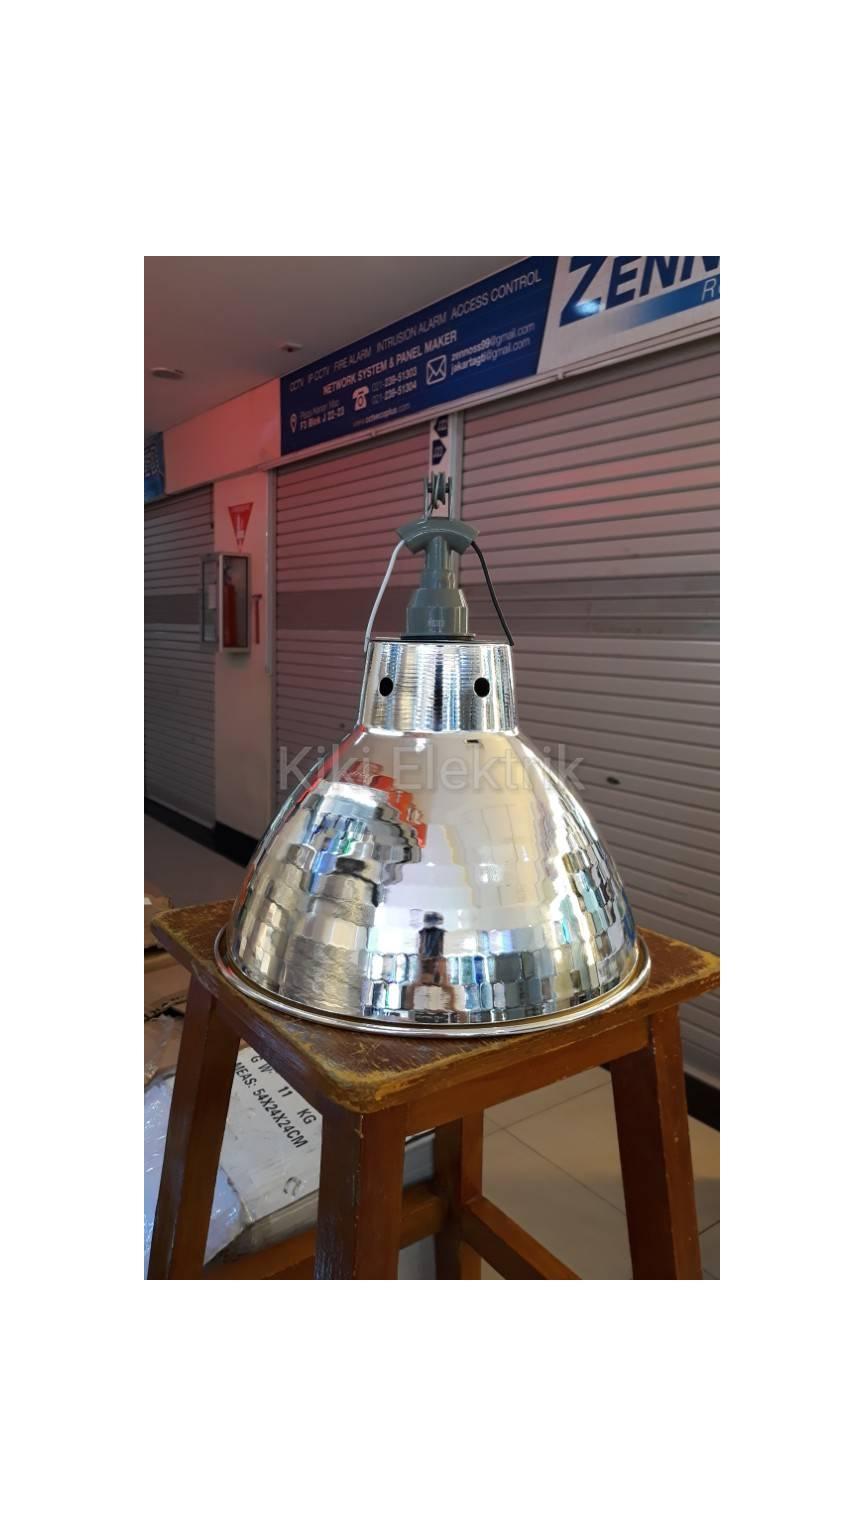 Kap Lampu Gantung Industri Kilap Diameter 30 cm + Fitting E27 MURAH!!